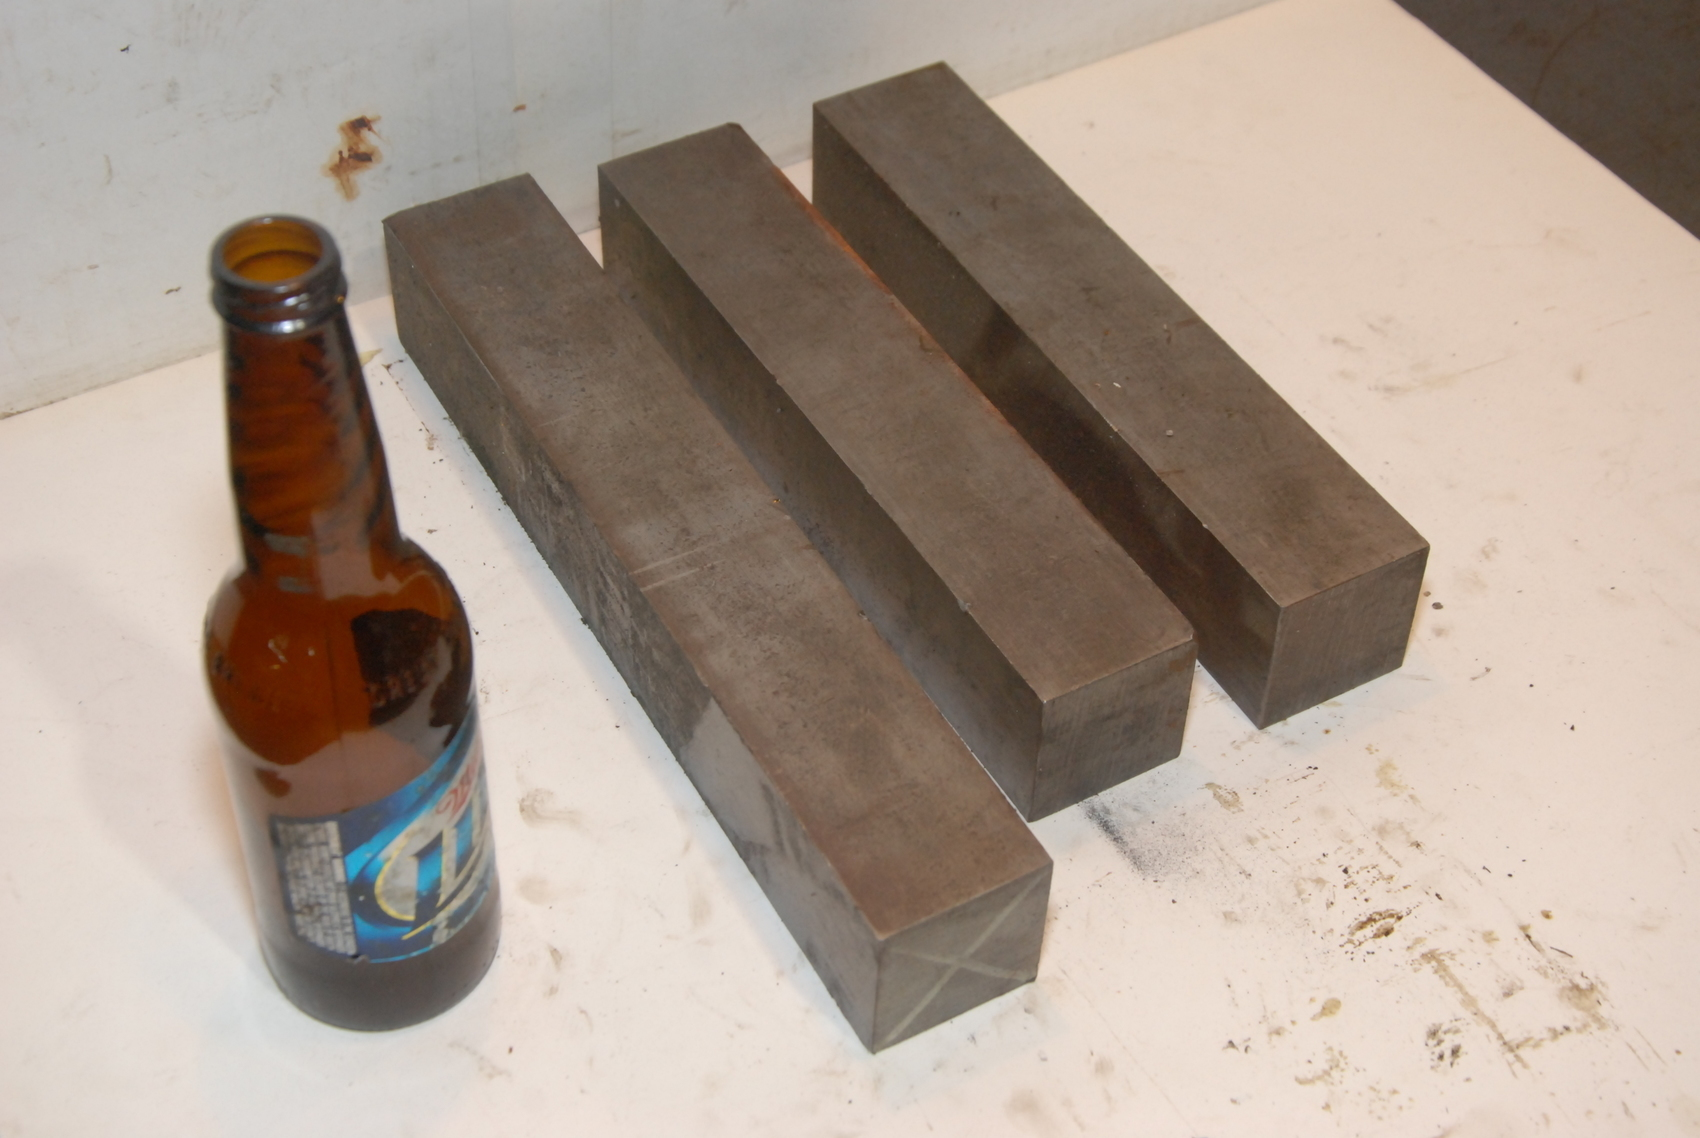 Lot of 3 steel Rectangular Bar for blacksmith anvil,37.8lbs